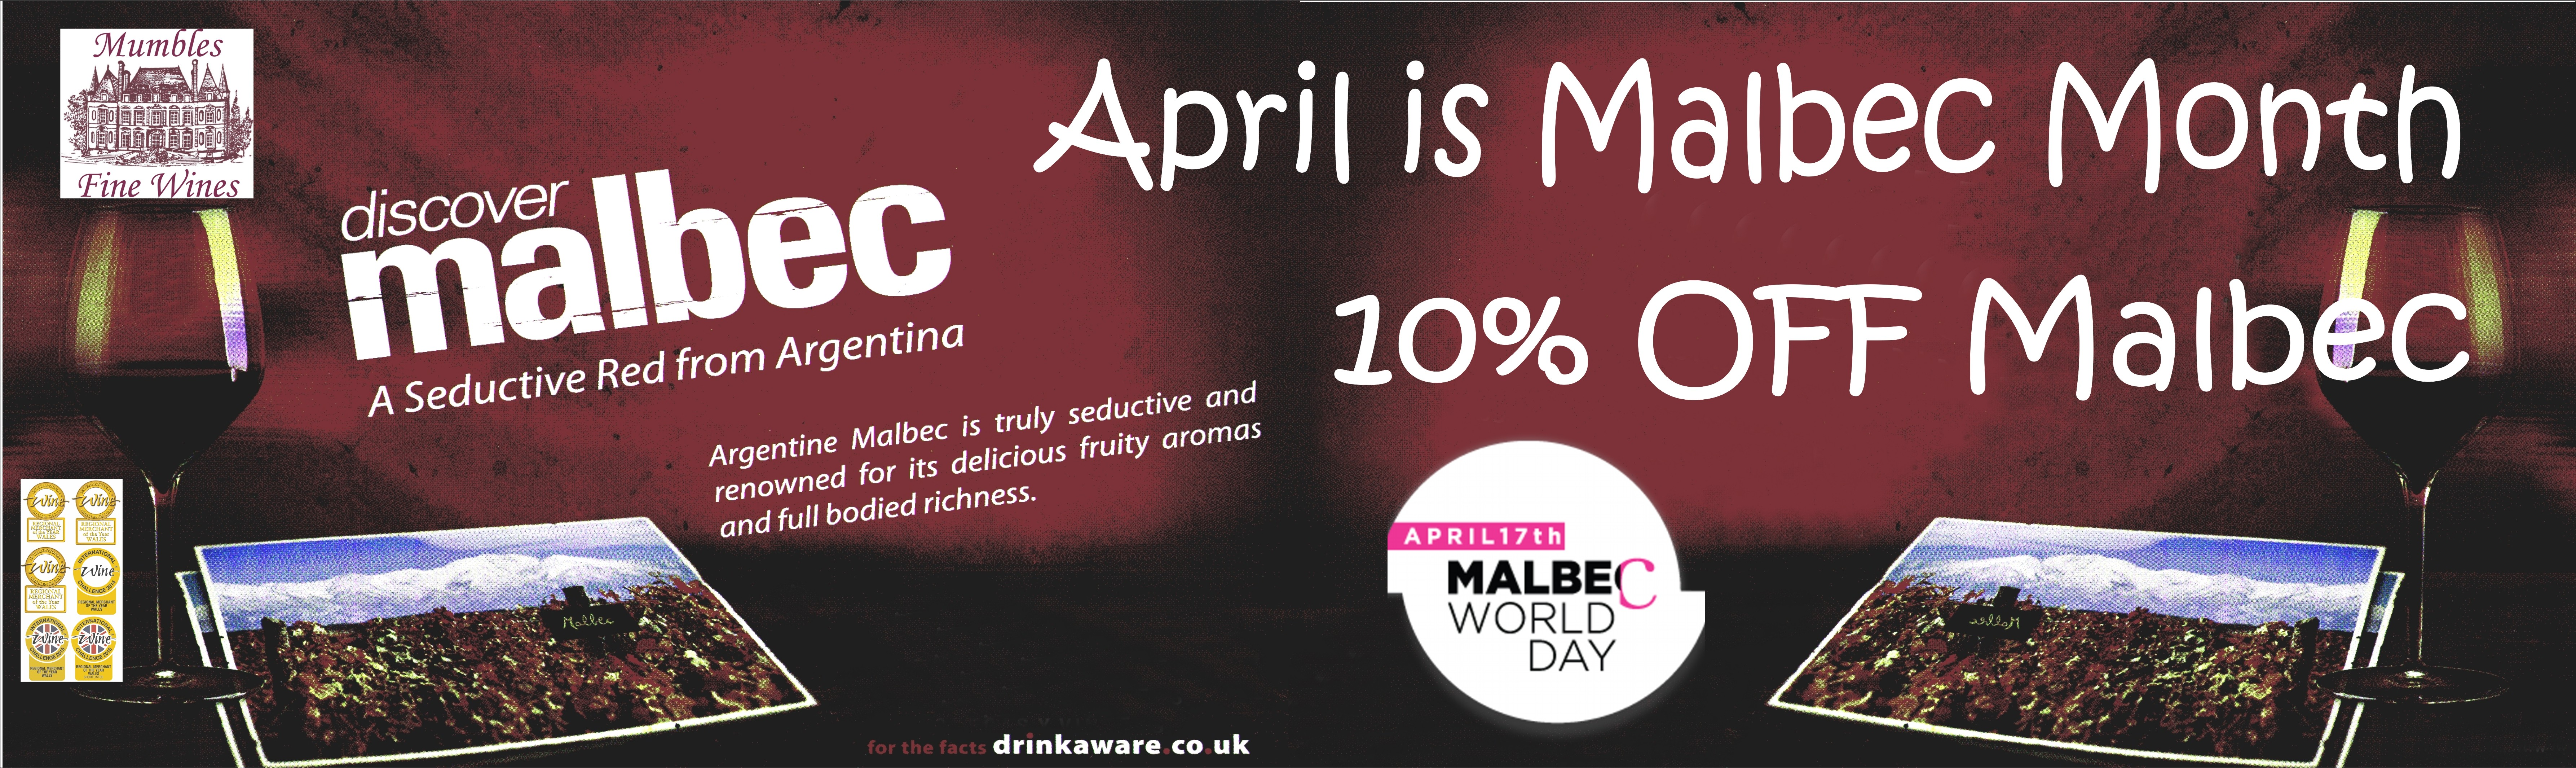 Malbec Month 10% Off